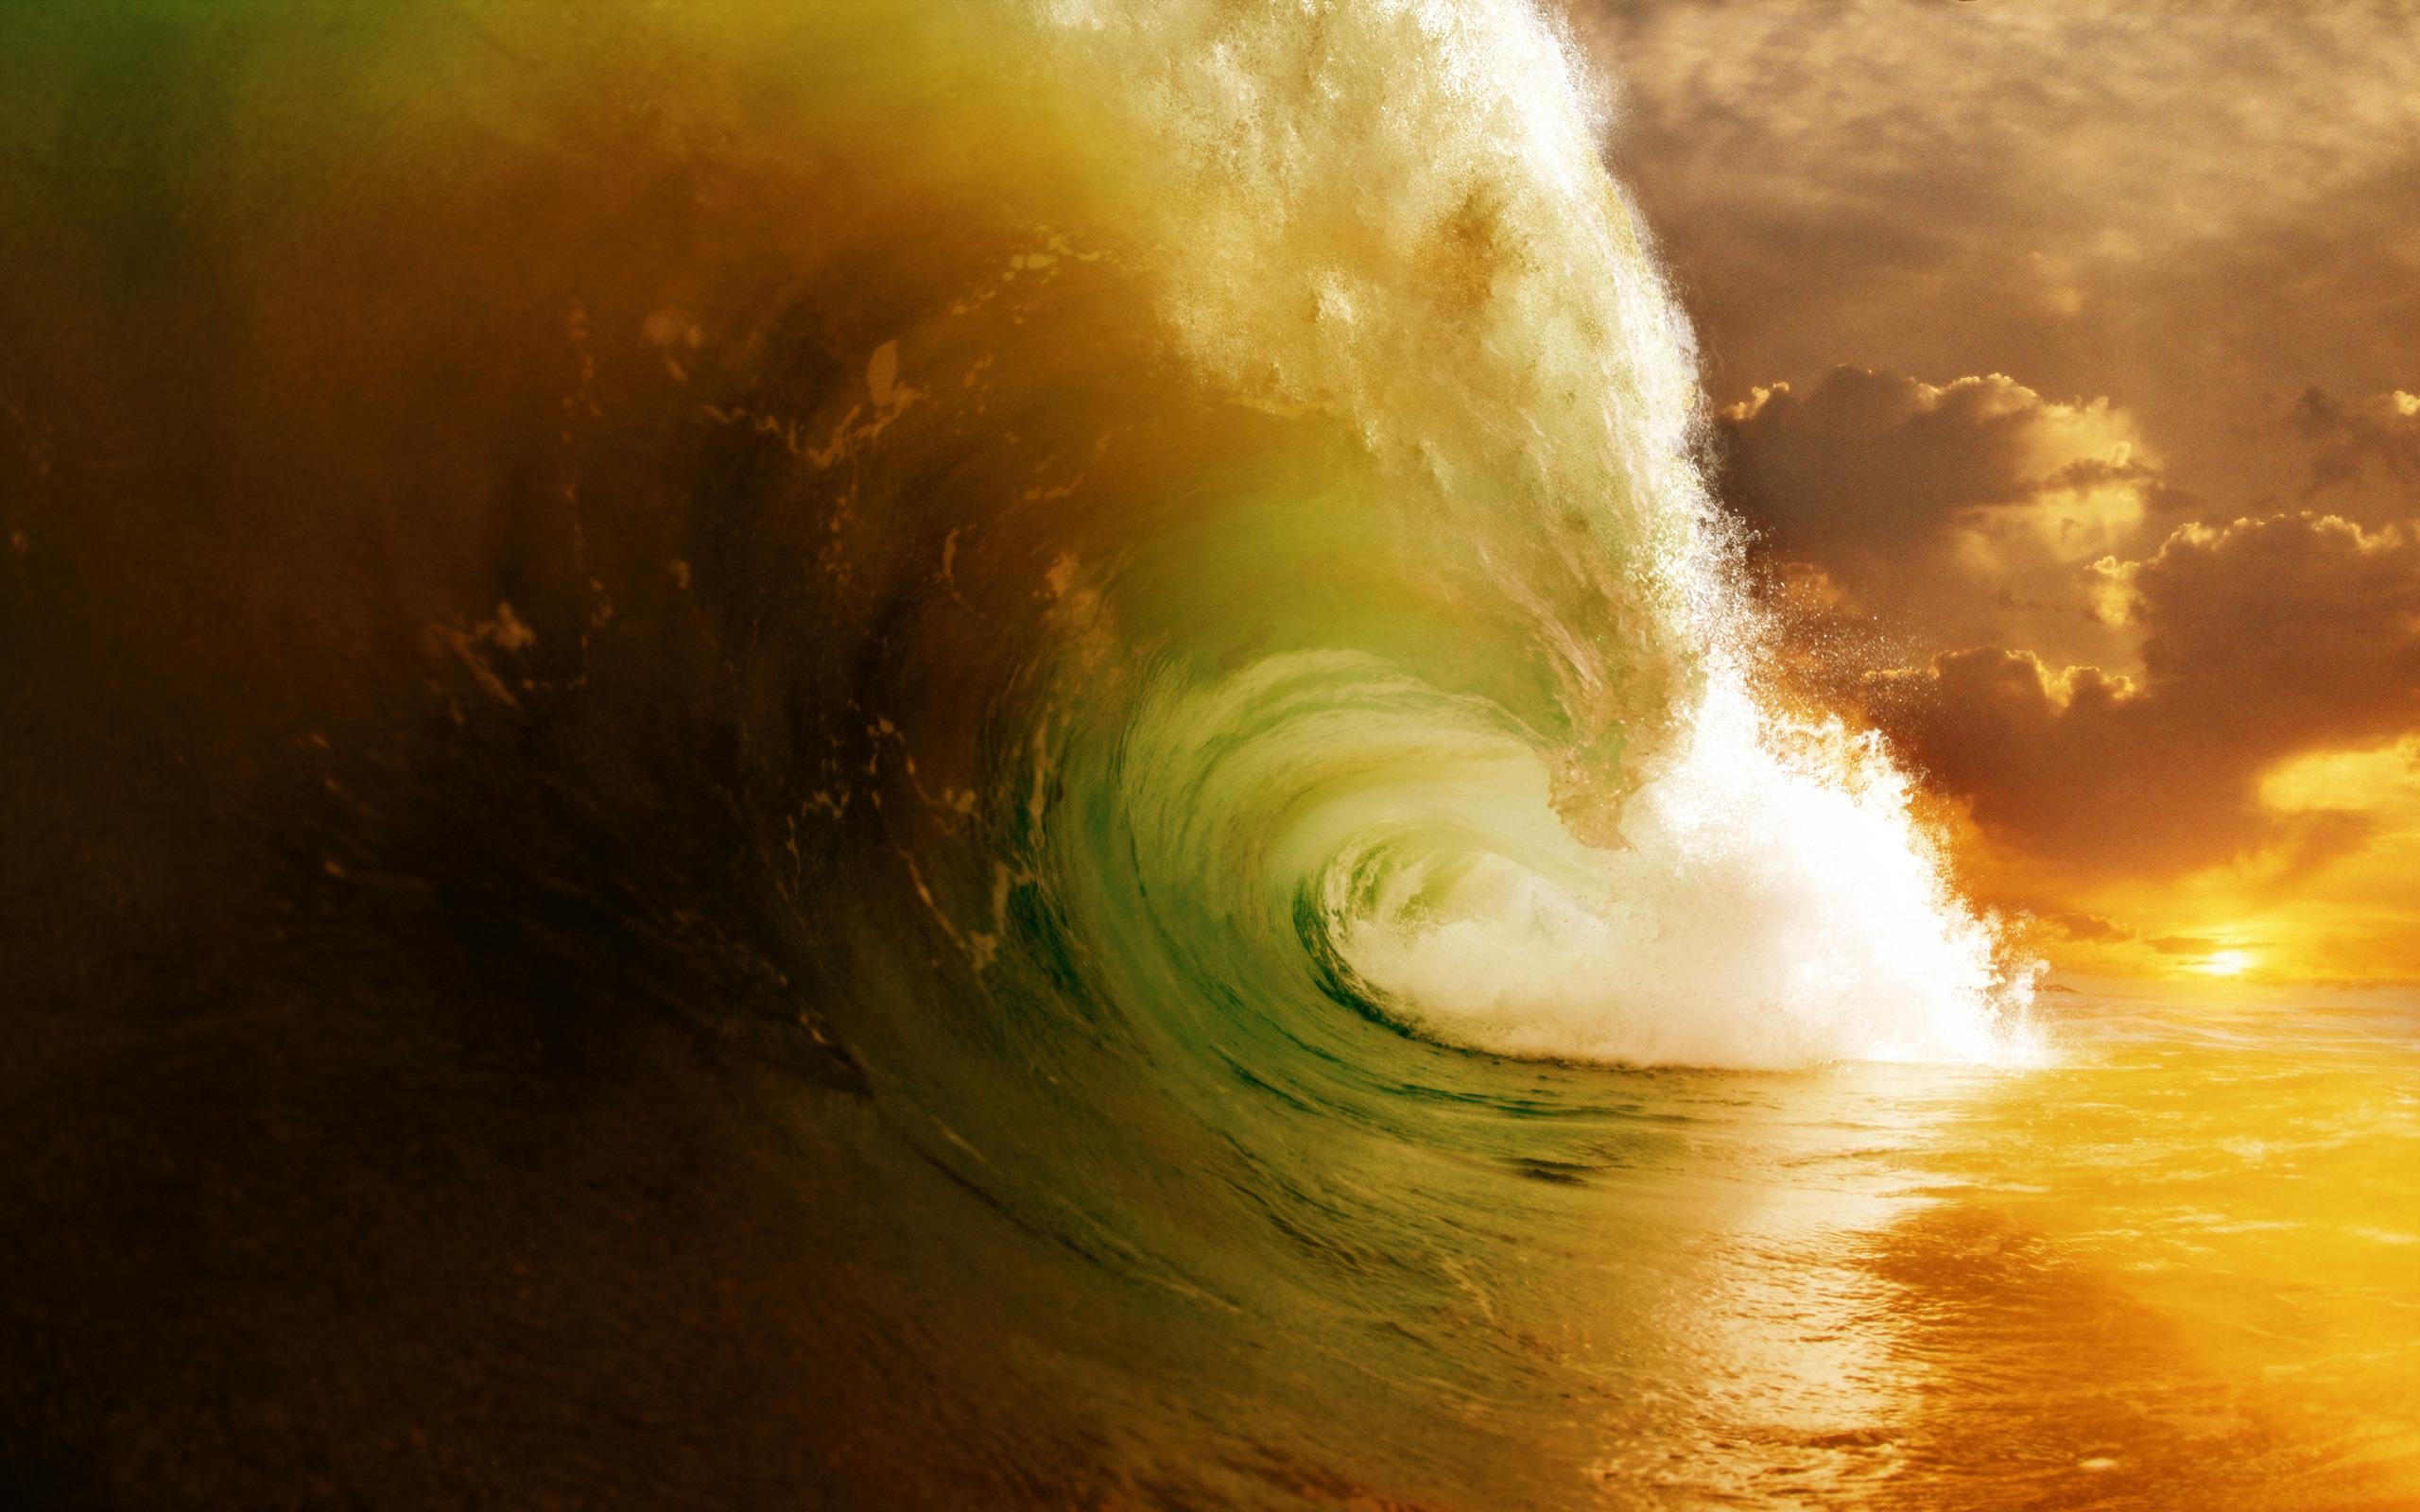 Earth - Wave  Wallpaper